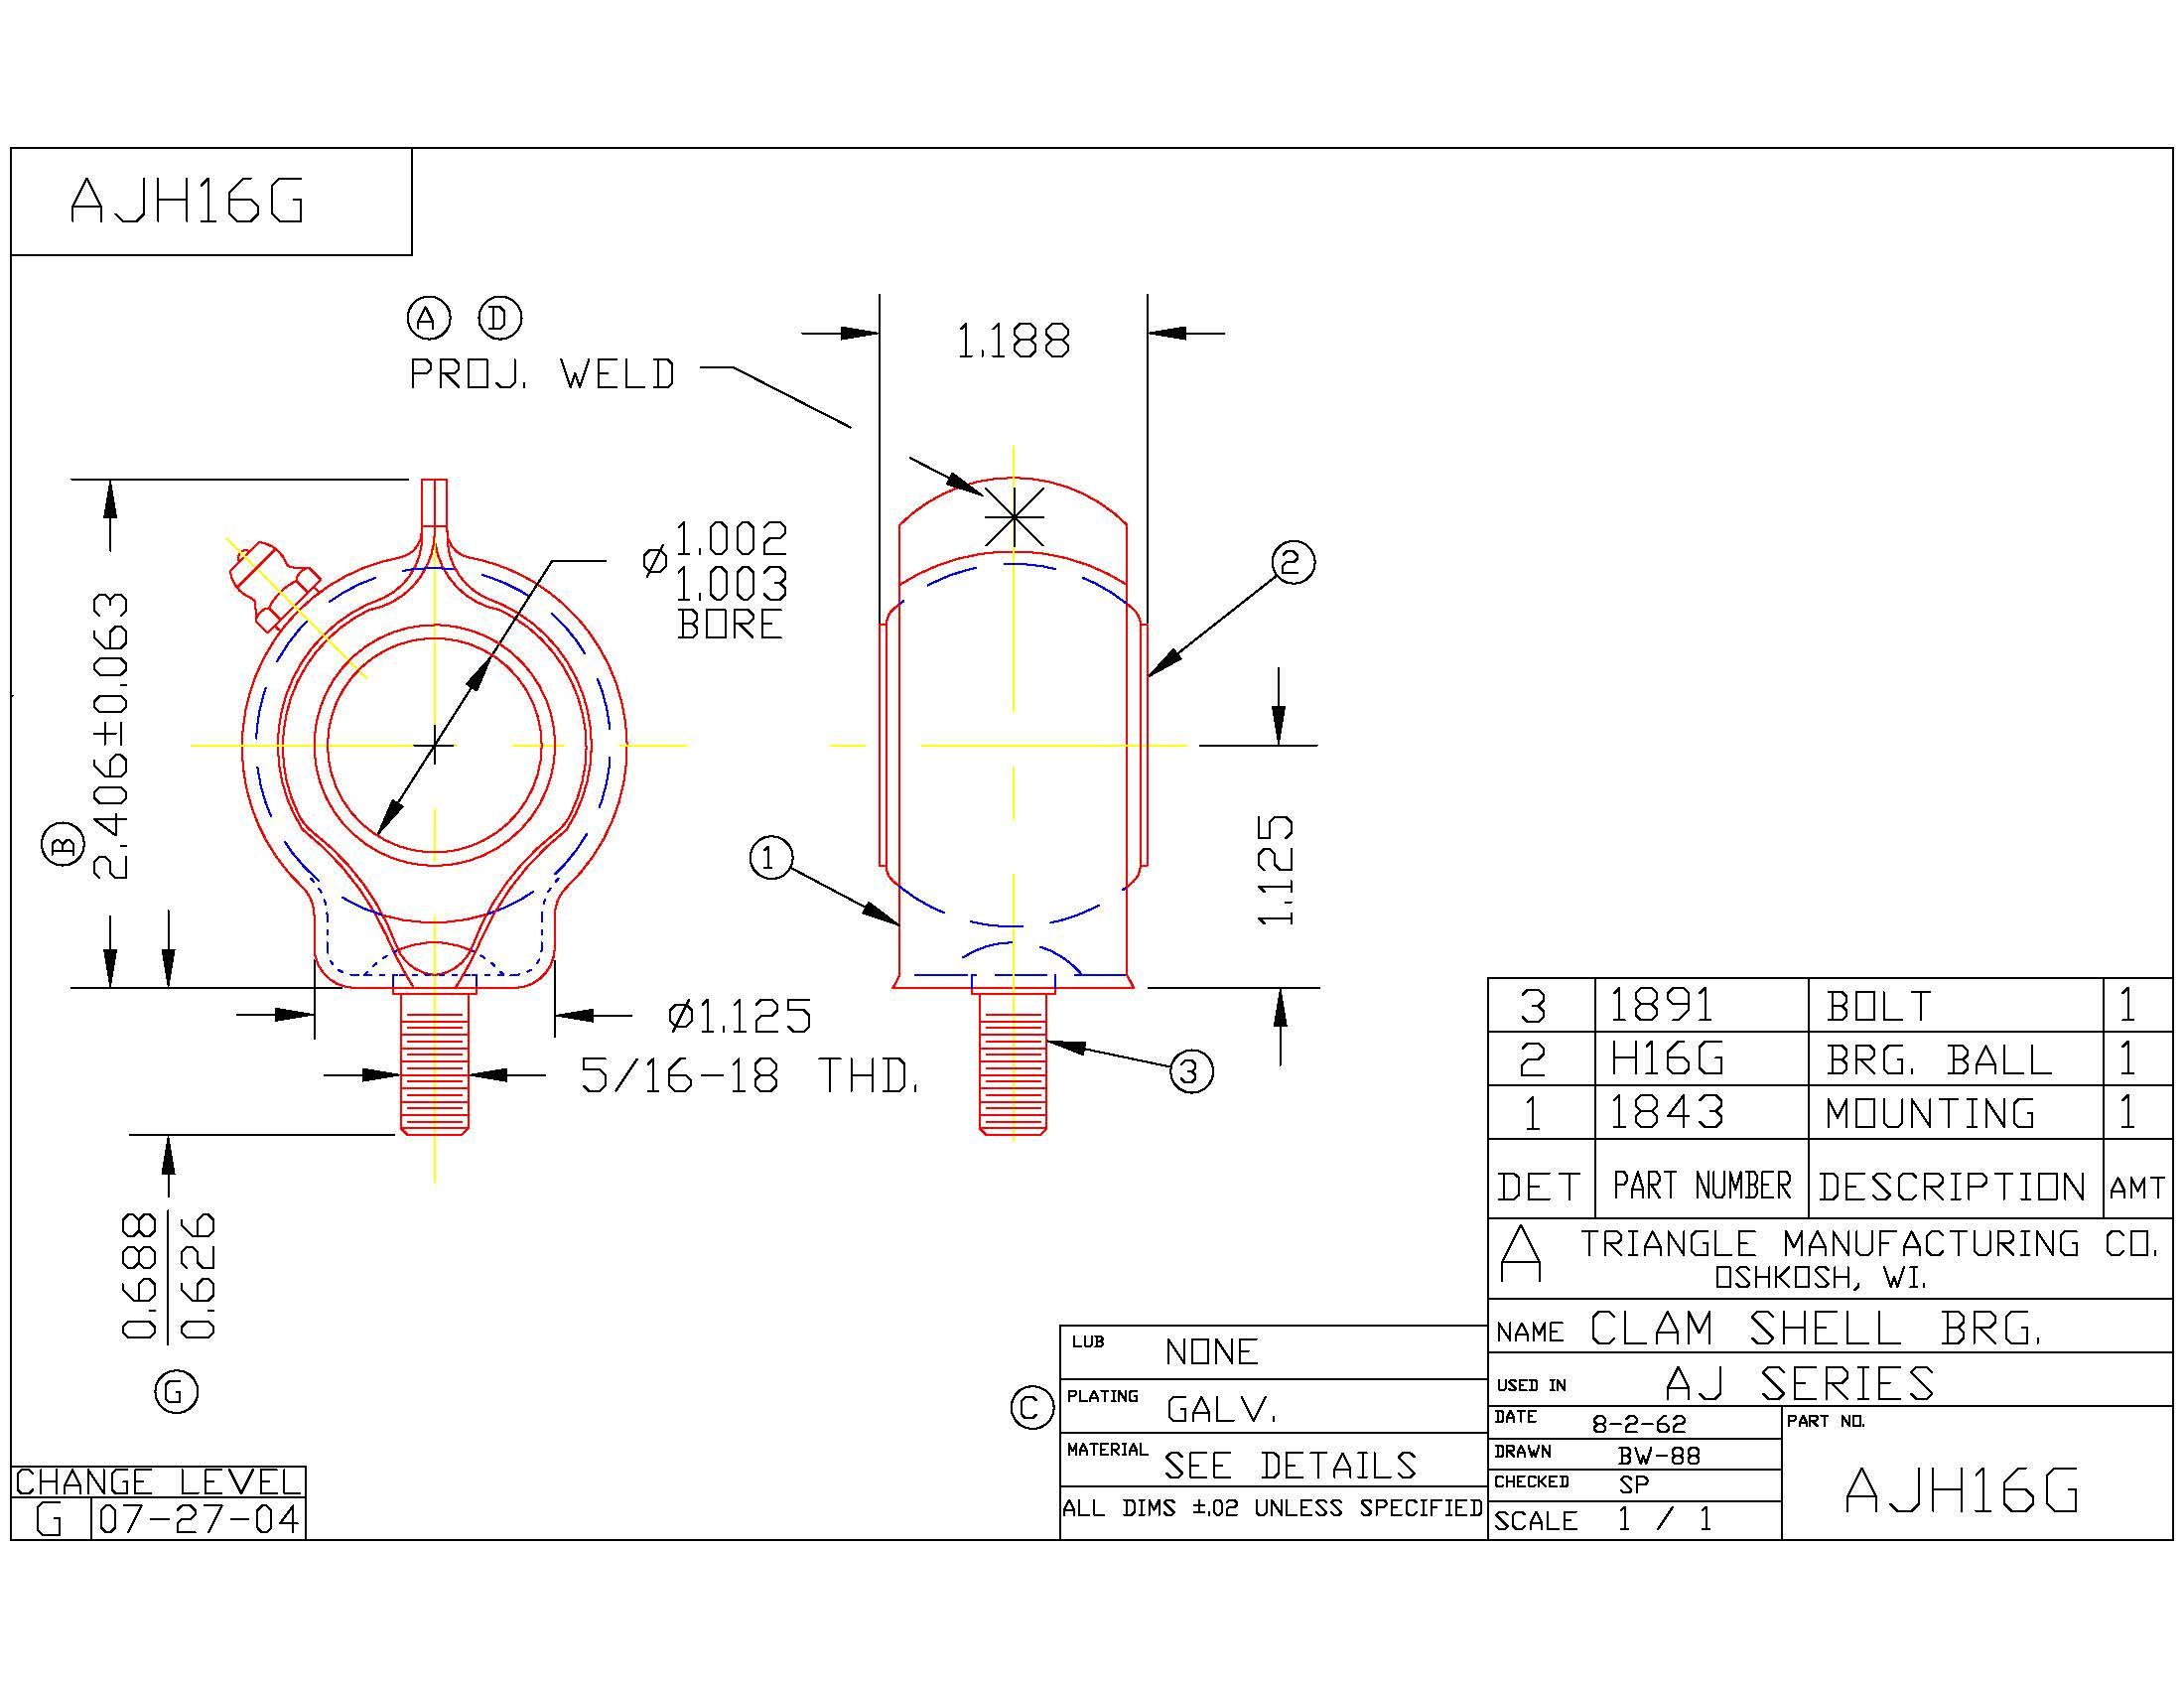 Clamshell Bearing AJH16G